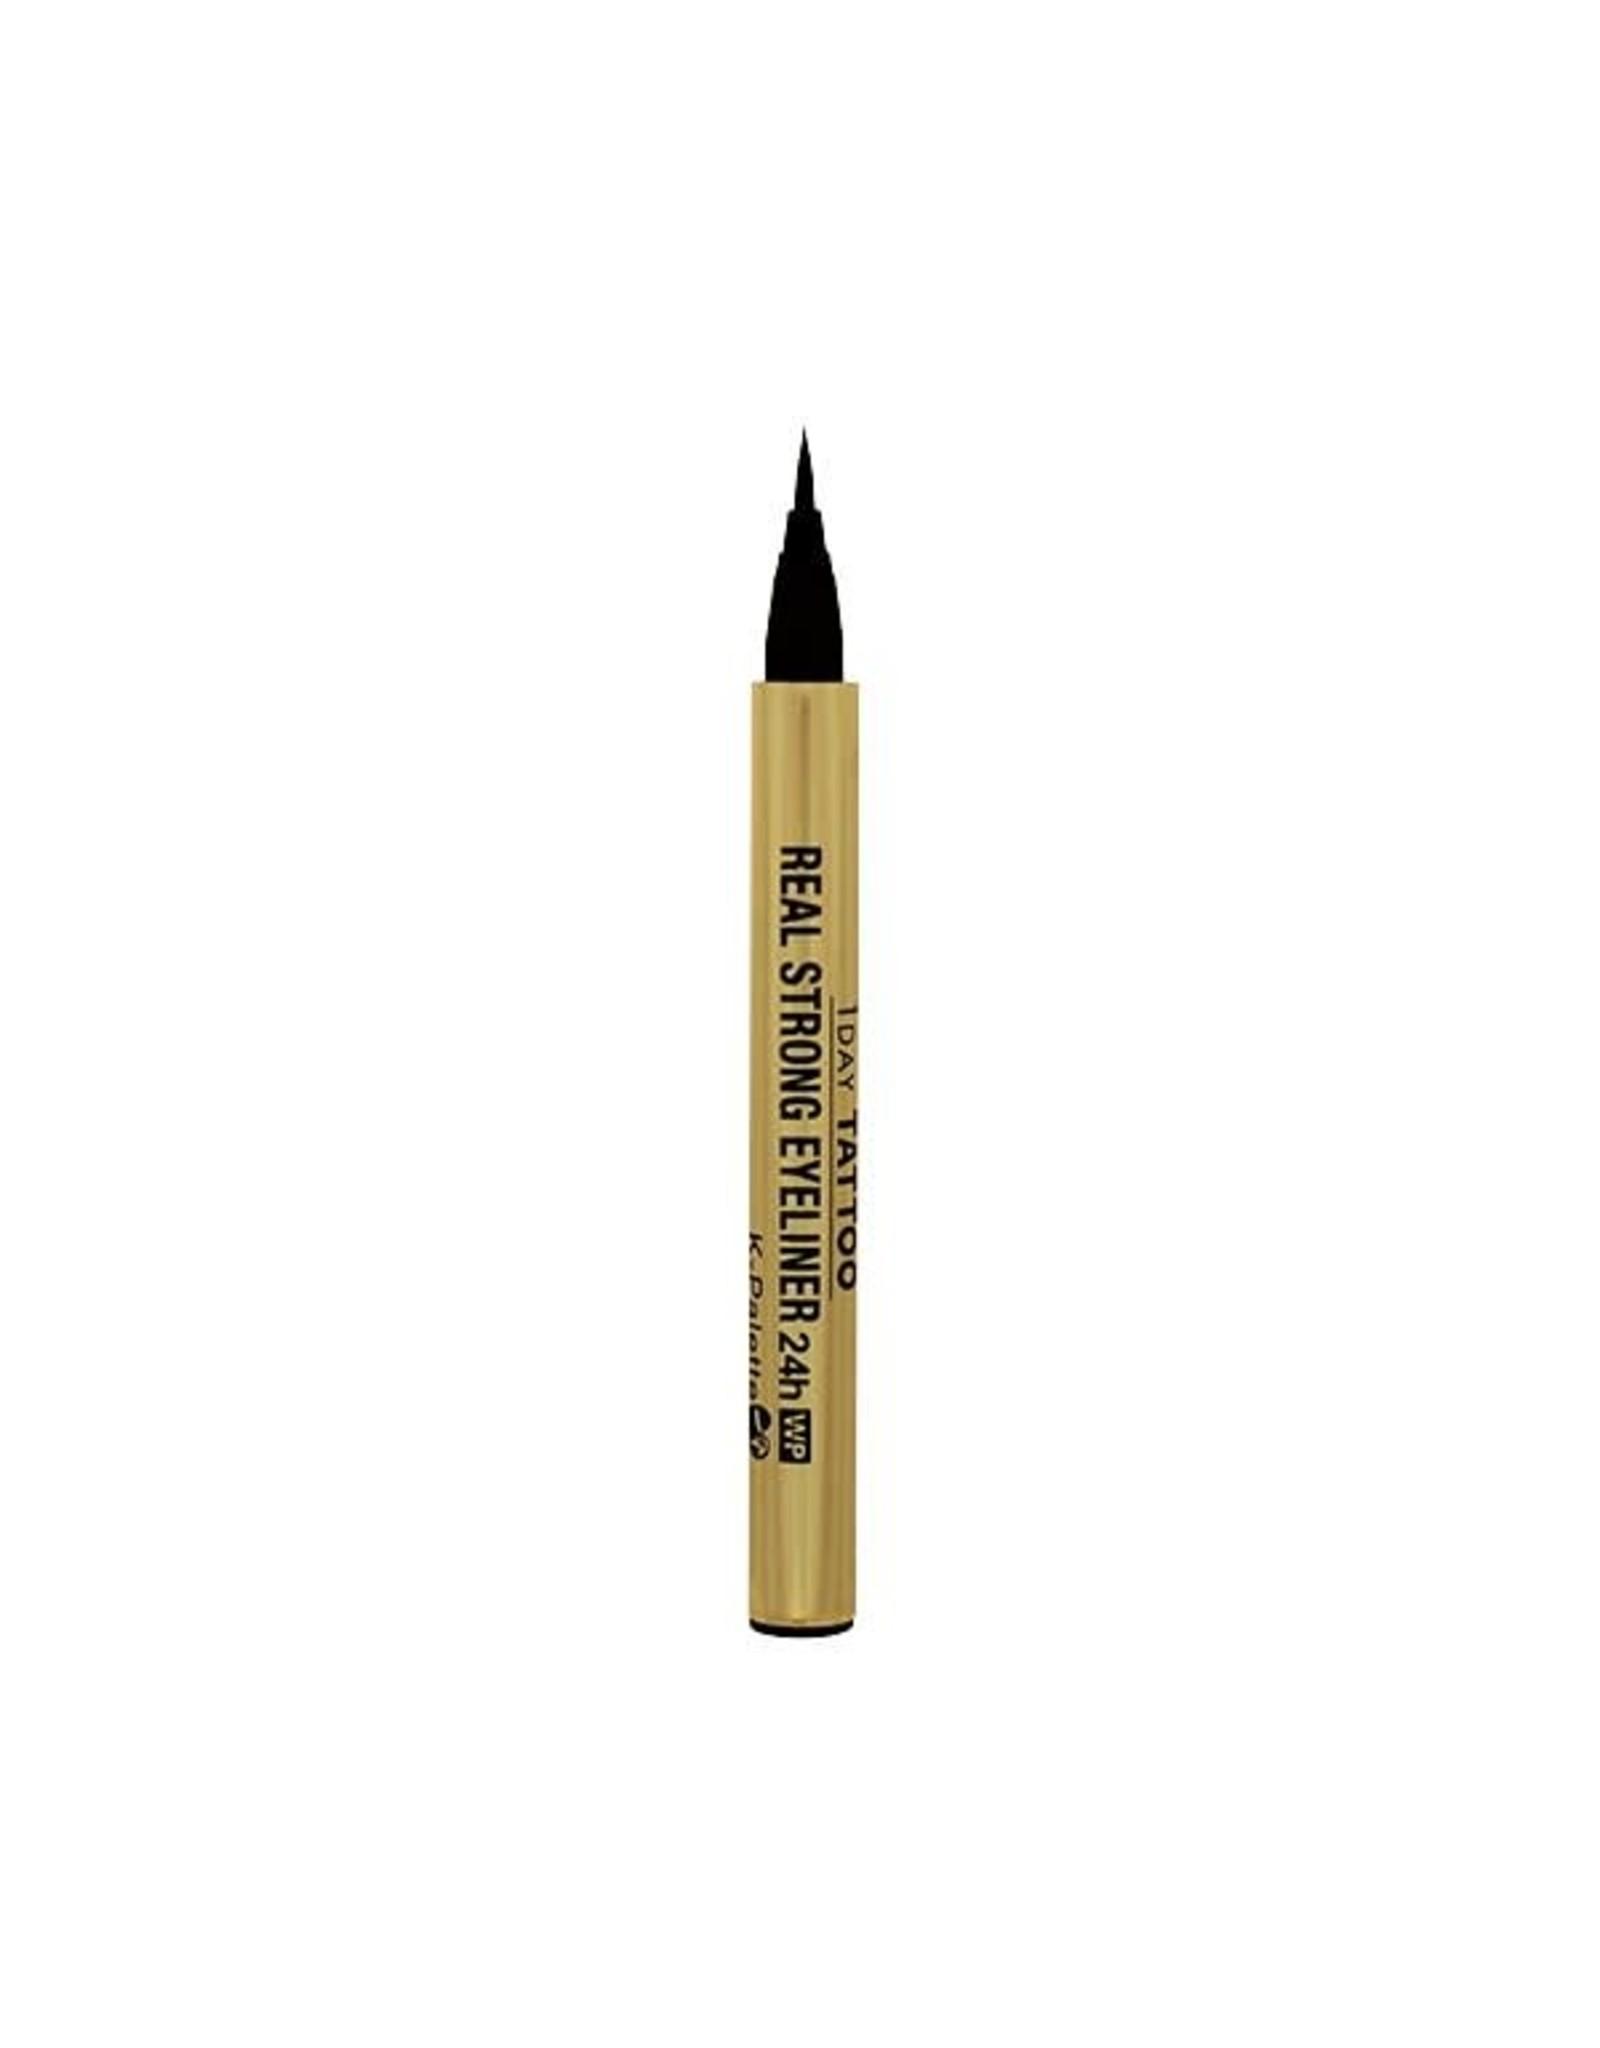 K-Palette K-Palette Real Strong Eyeliner Retro Brown